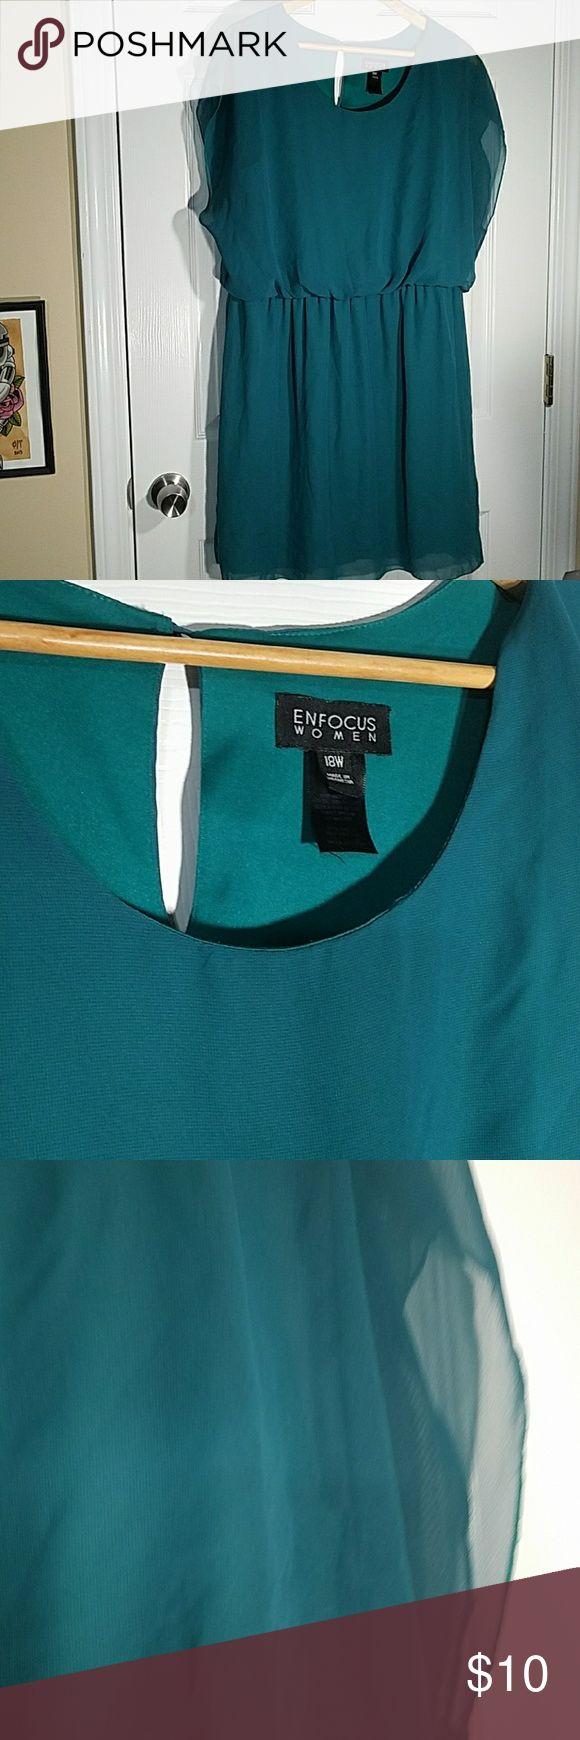 Enfocus Women green chiffon dress Enfocus Women green chiffon dress   Small holes in back of dress. See photo enfocus Dresses